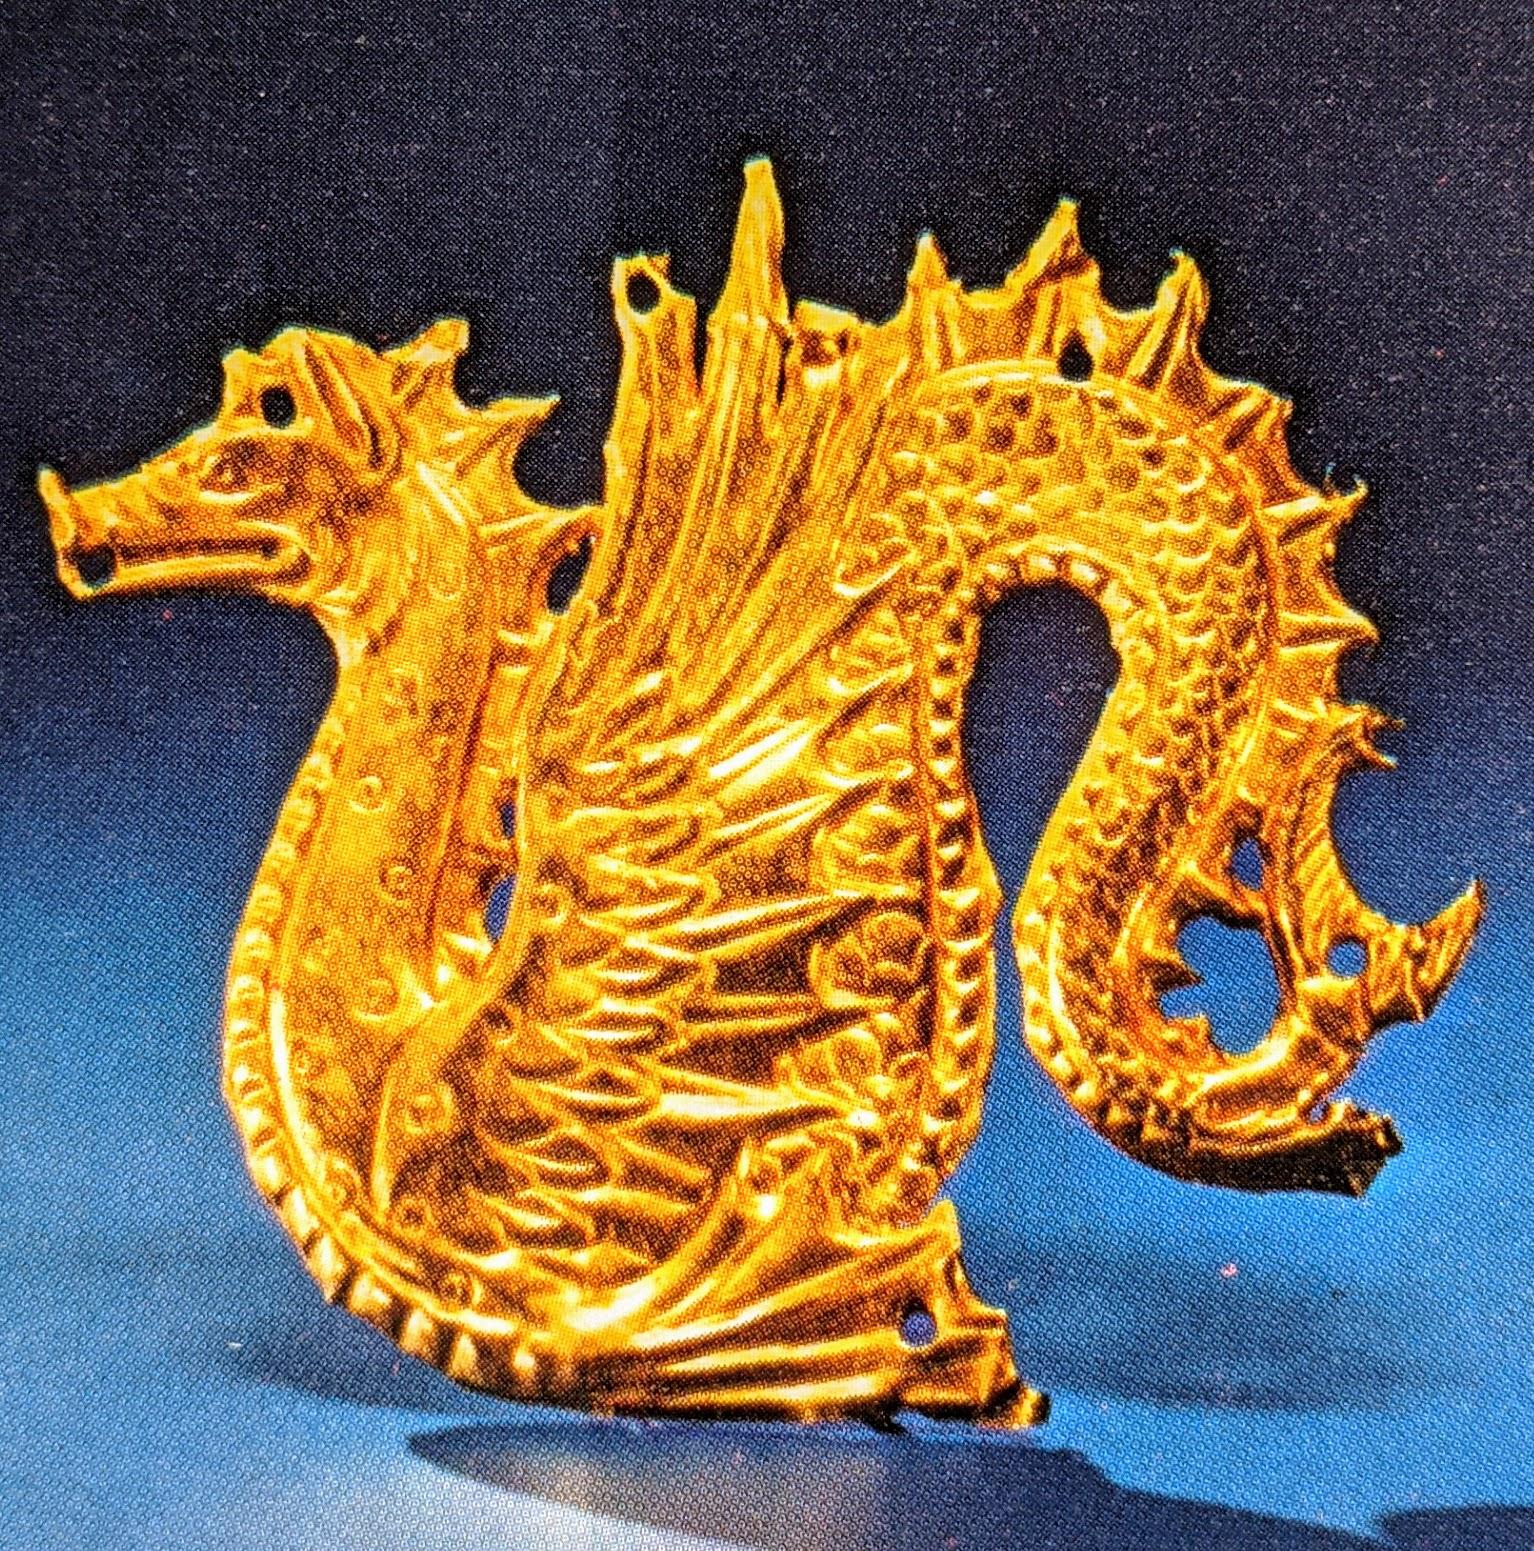 Ketos (sea monster) gold applique plaque